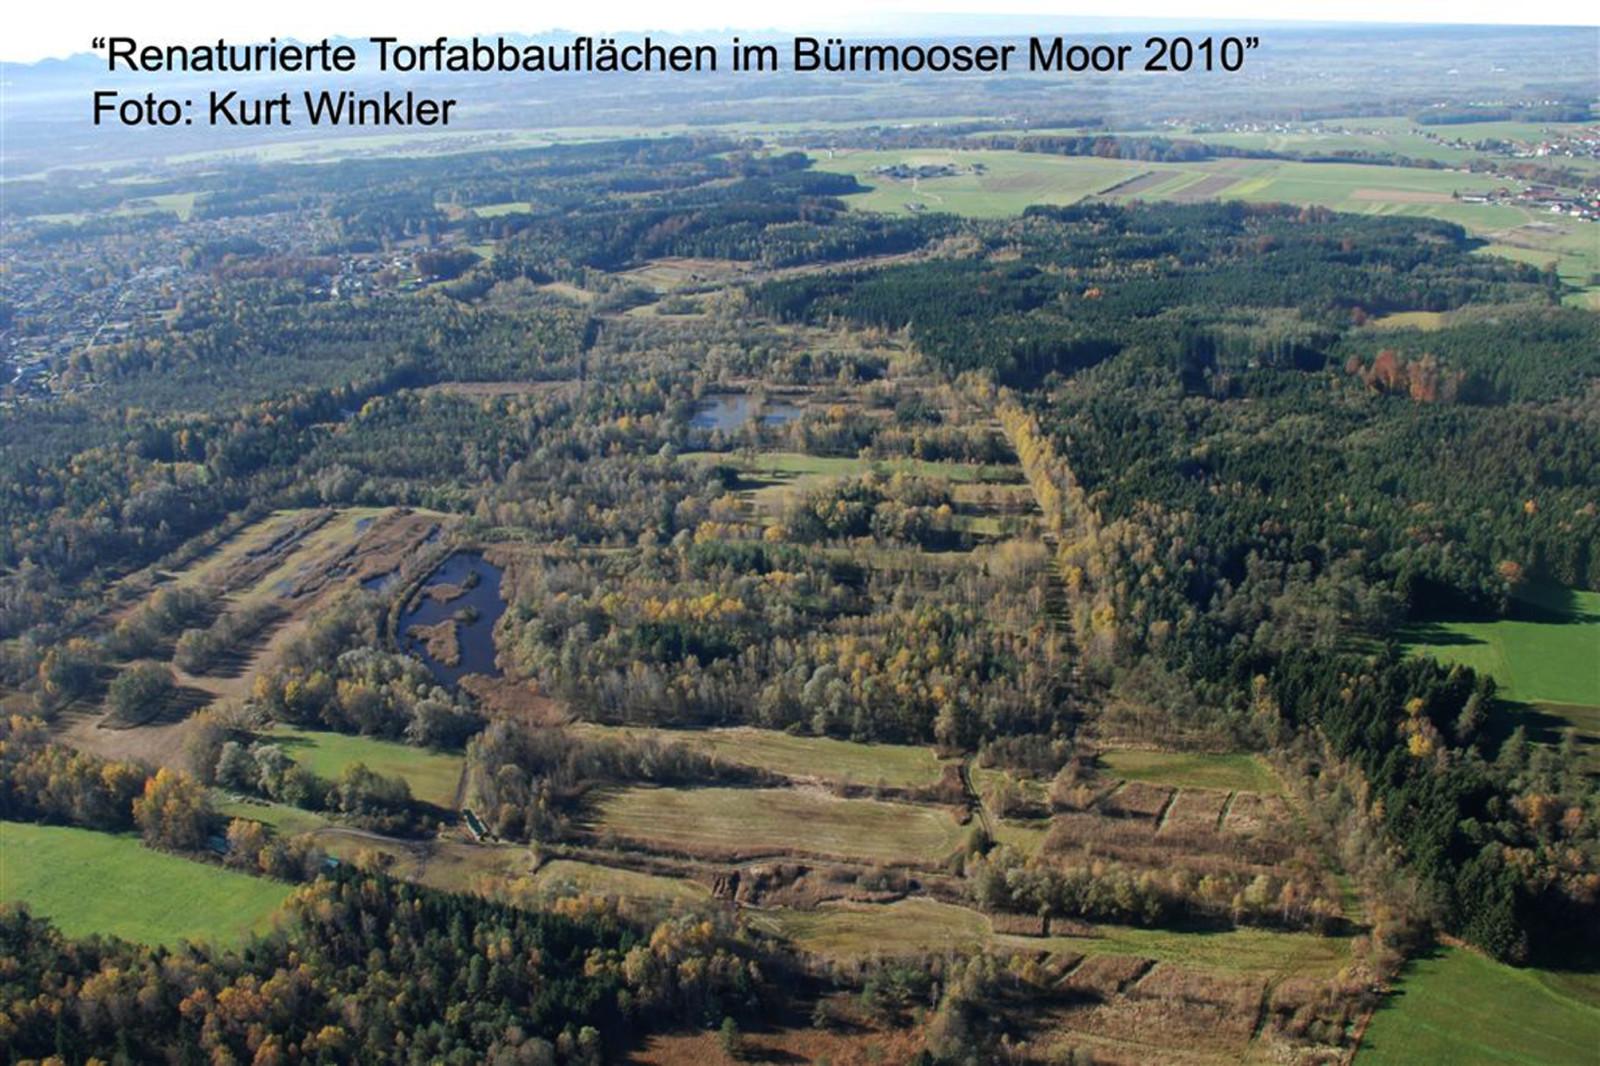 Rettung: Das renaturierte Bürmooser Moor 2010.